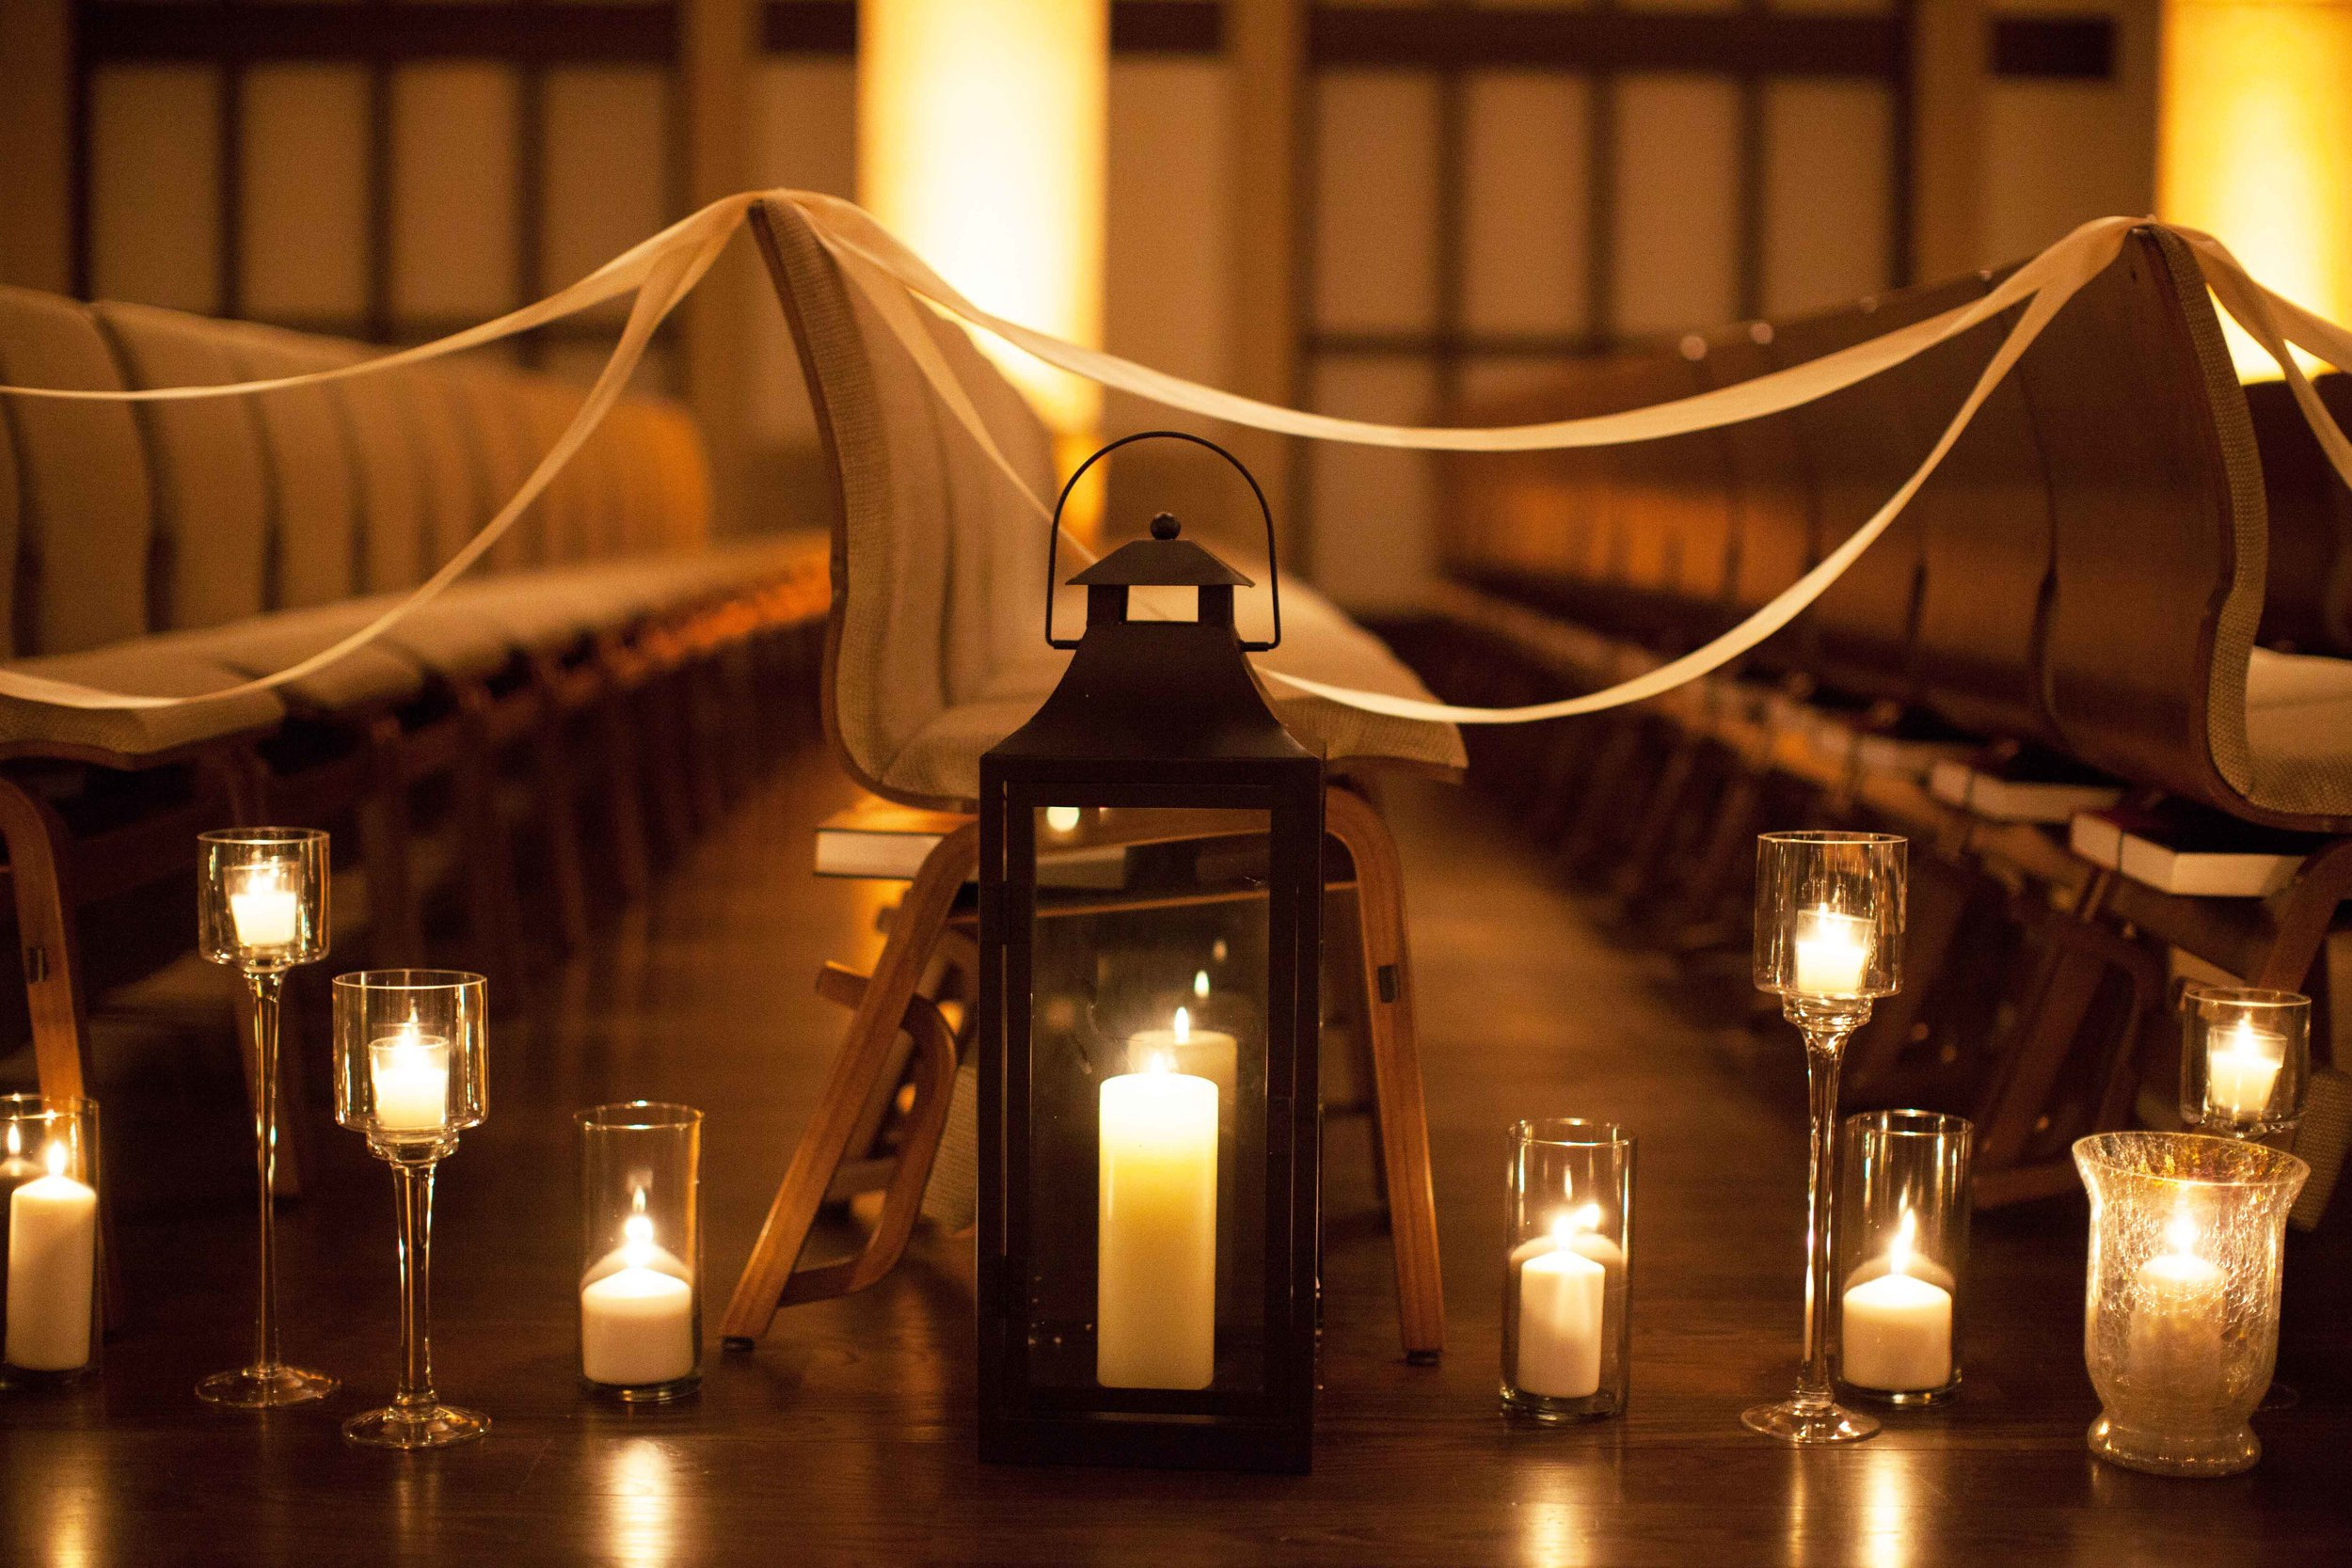 wedding-holy-wish-lanterns-for-weddings-for-church-wedding-ceremony-inspiring-wedding-lanterns.jpg